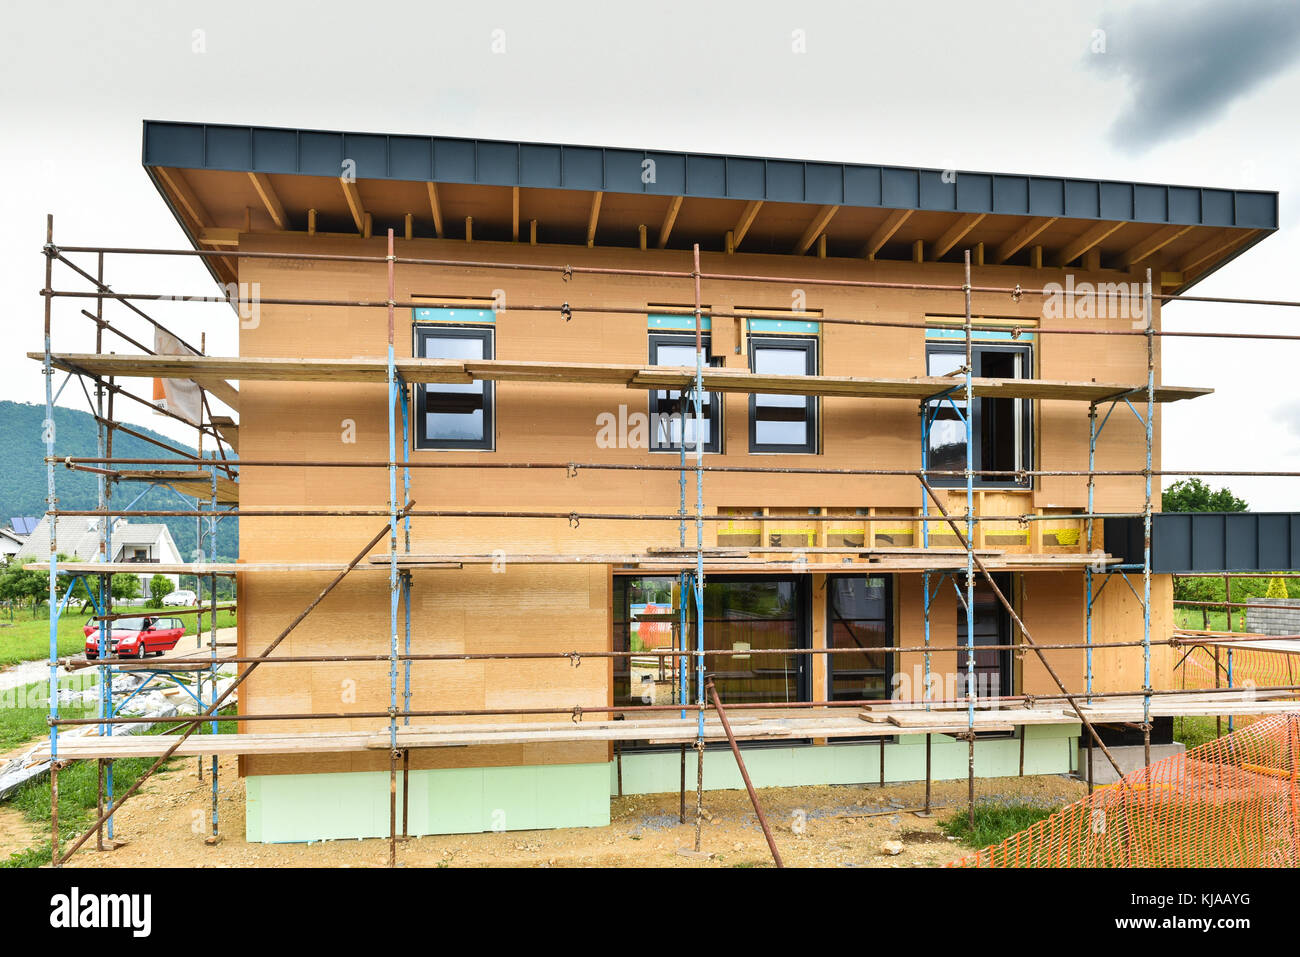 Best Kitchen Gallery: Building Energy Efficient Passive Wooden House Construction Site of Cheap Energy Efficient Home Construction on rachelxblog.com